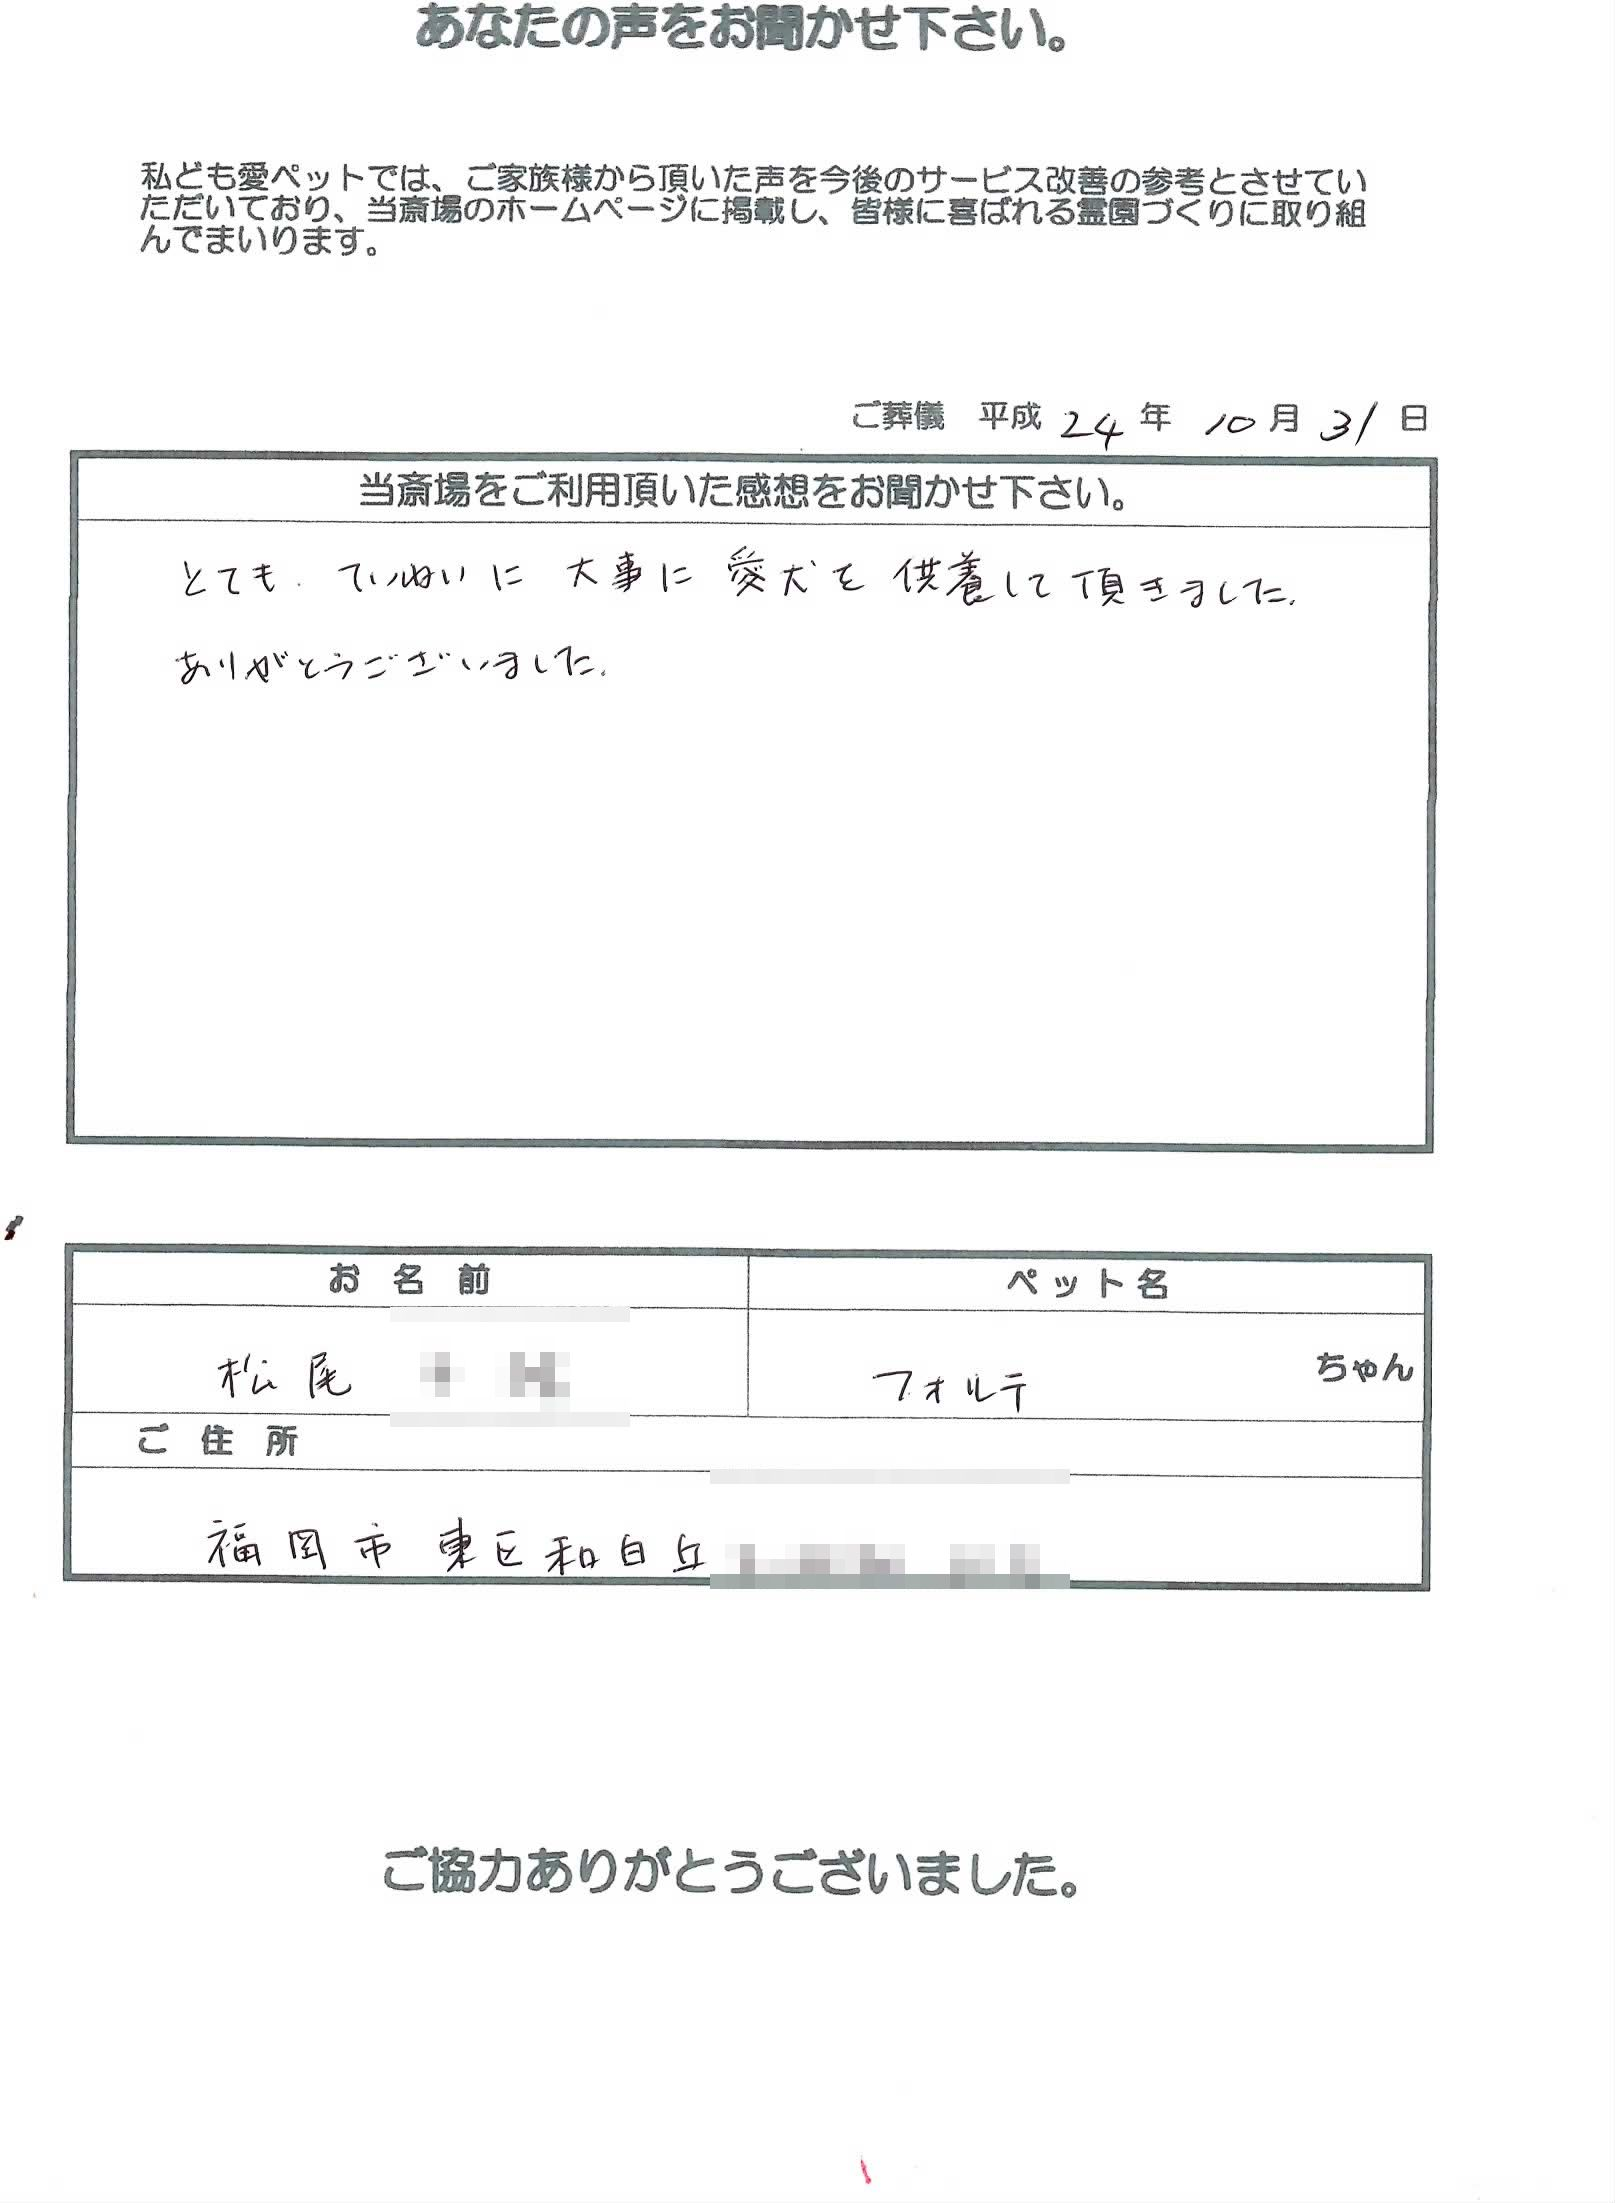 k121031-4.jpg